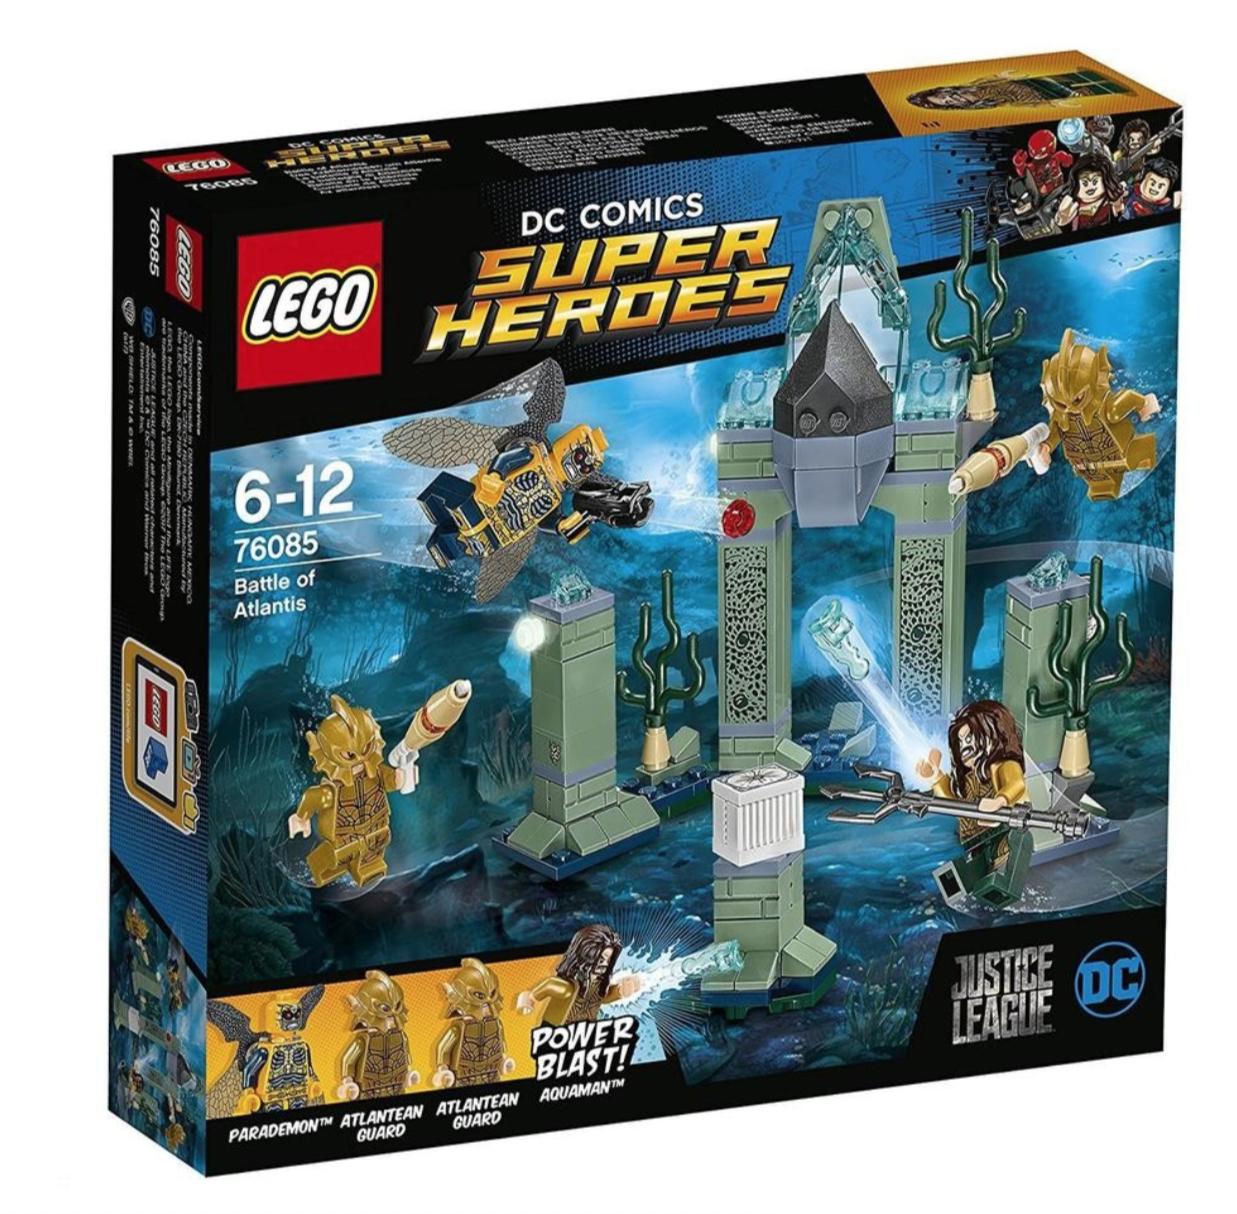 LEGO COMICS SUPER HEROES BATTLE OF ATLANTIS JOUET JEU JEUX CONSTRUCTION ENFANT NOEL NEUF 5702015868709 COMASOUND KARTEL 75085 ITEM 6175506